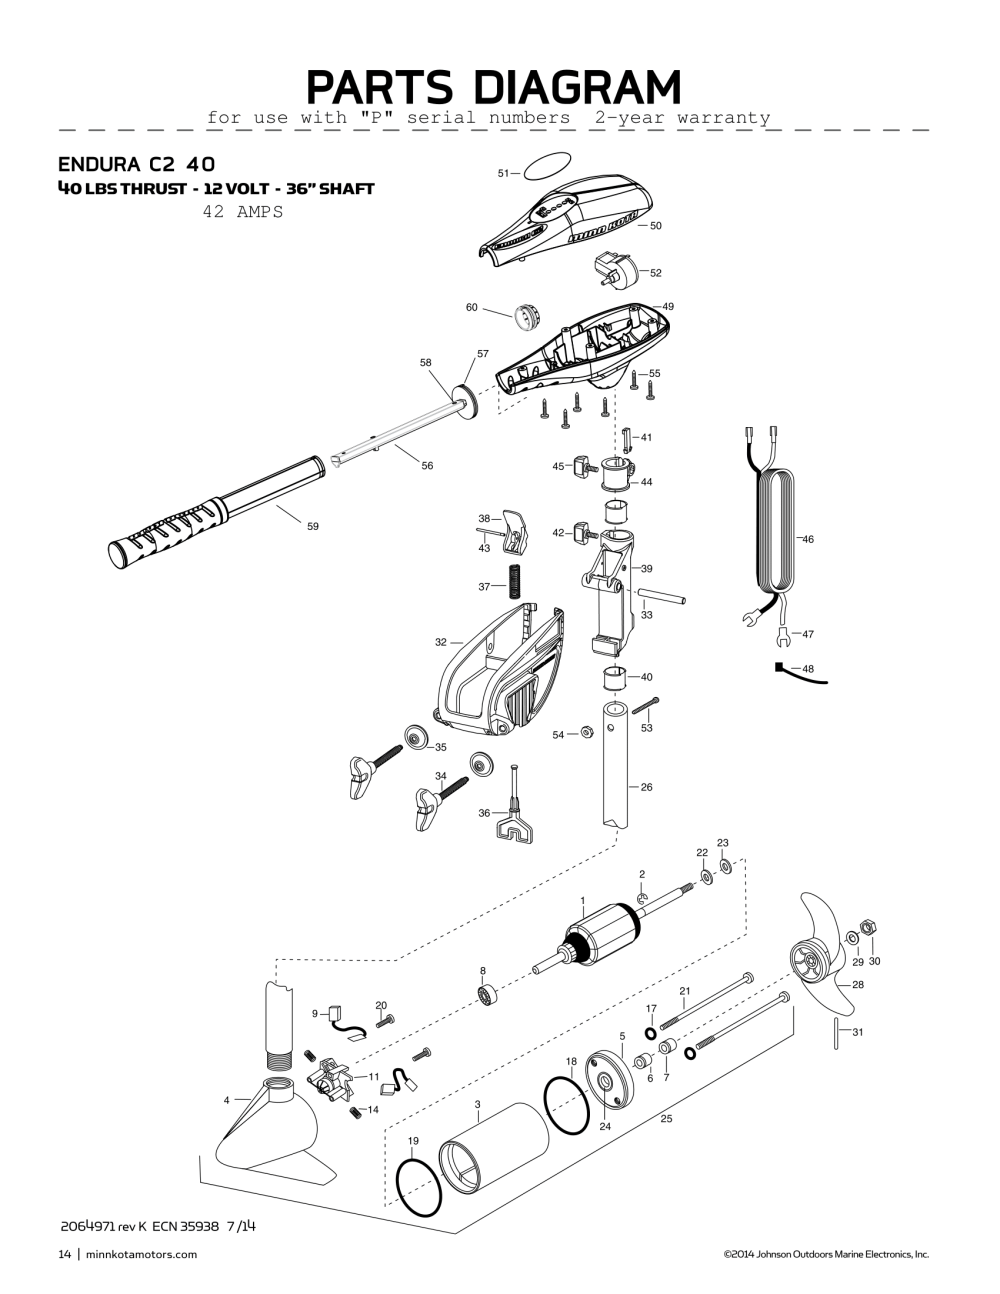 medium resolution of minn kota 55 wiring diagram wiring diagramwiring minn kota endura 40 diagram auto diagram databasewiring minn